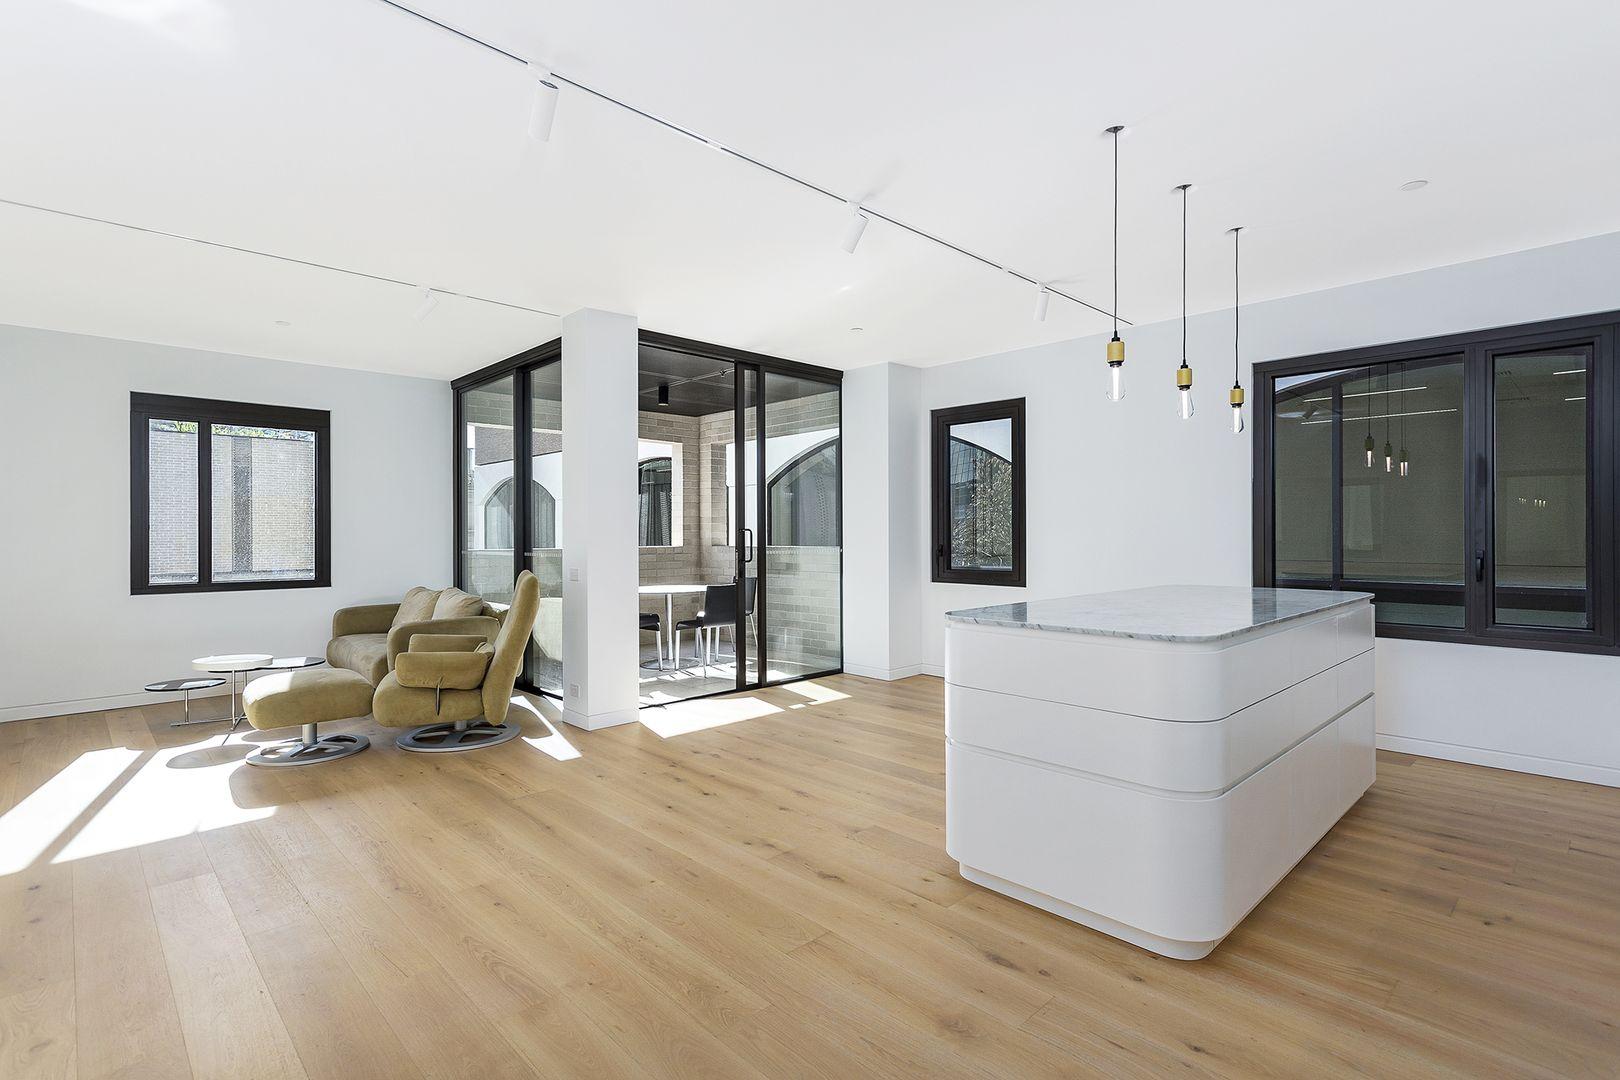 2 bedrooms Apartment / Unit / Flat in 401/18 Loftus Street SYDNEY NSW, 2000